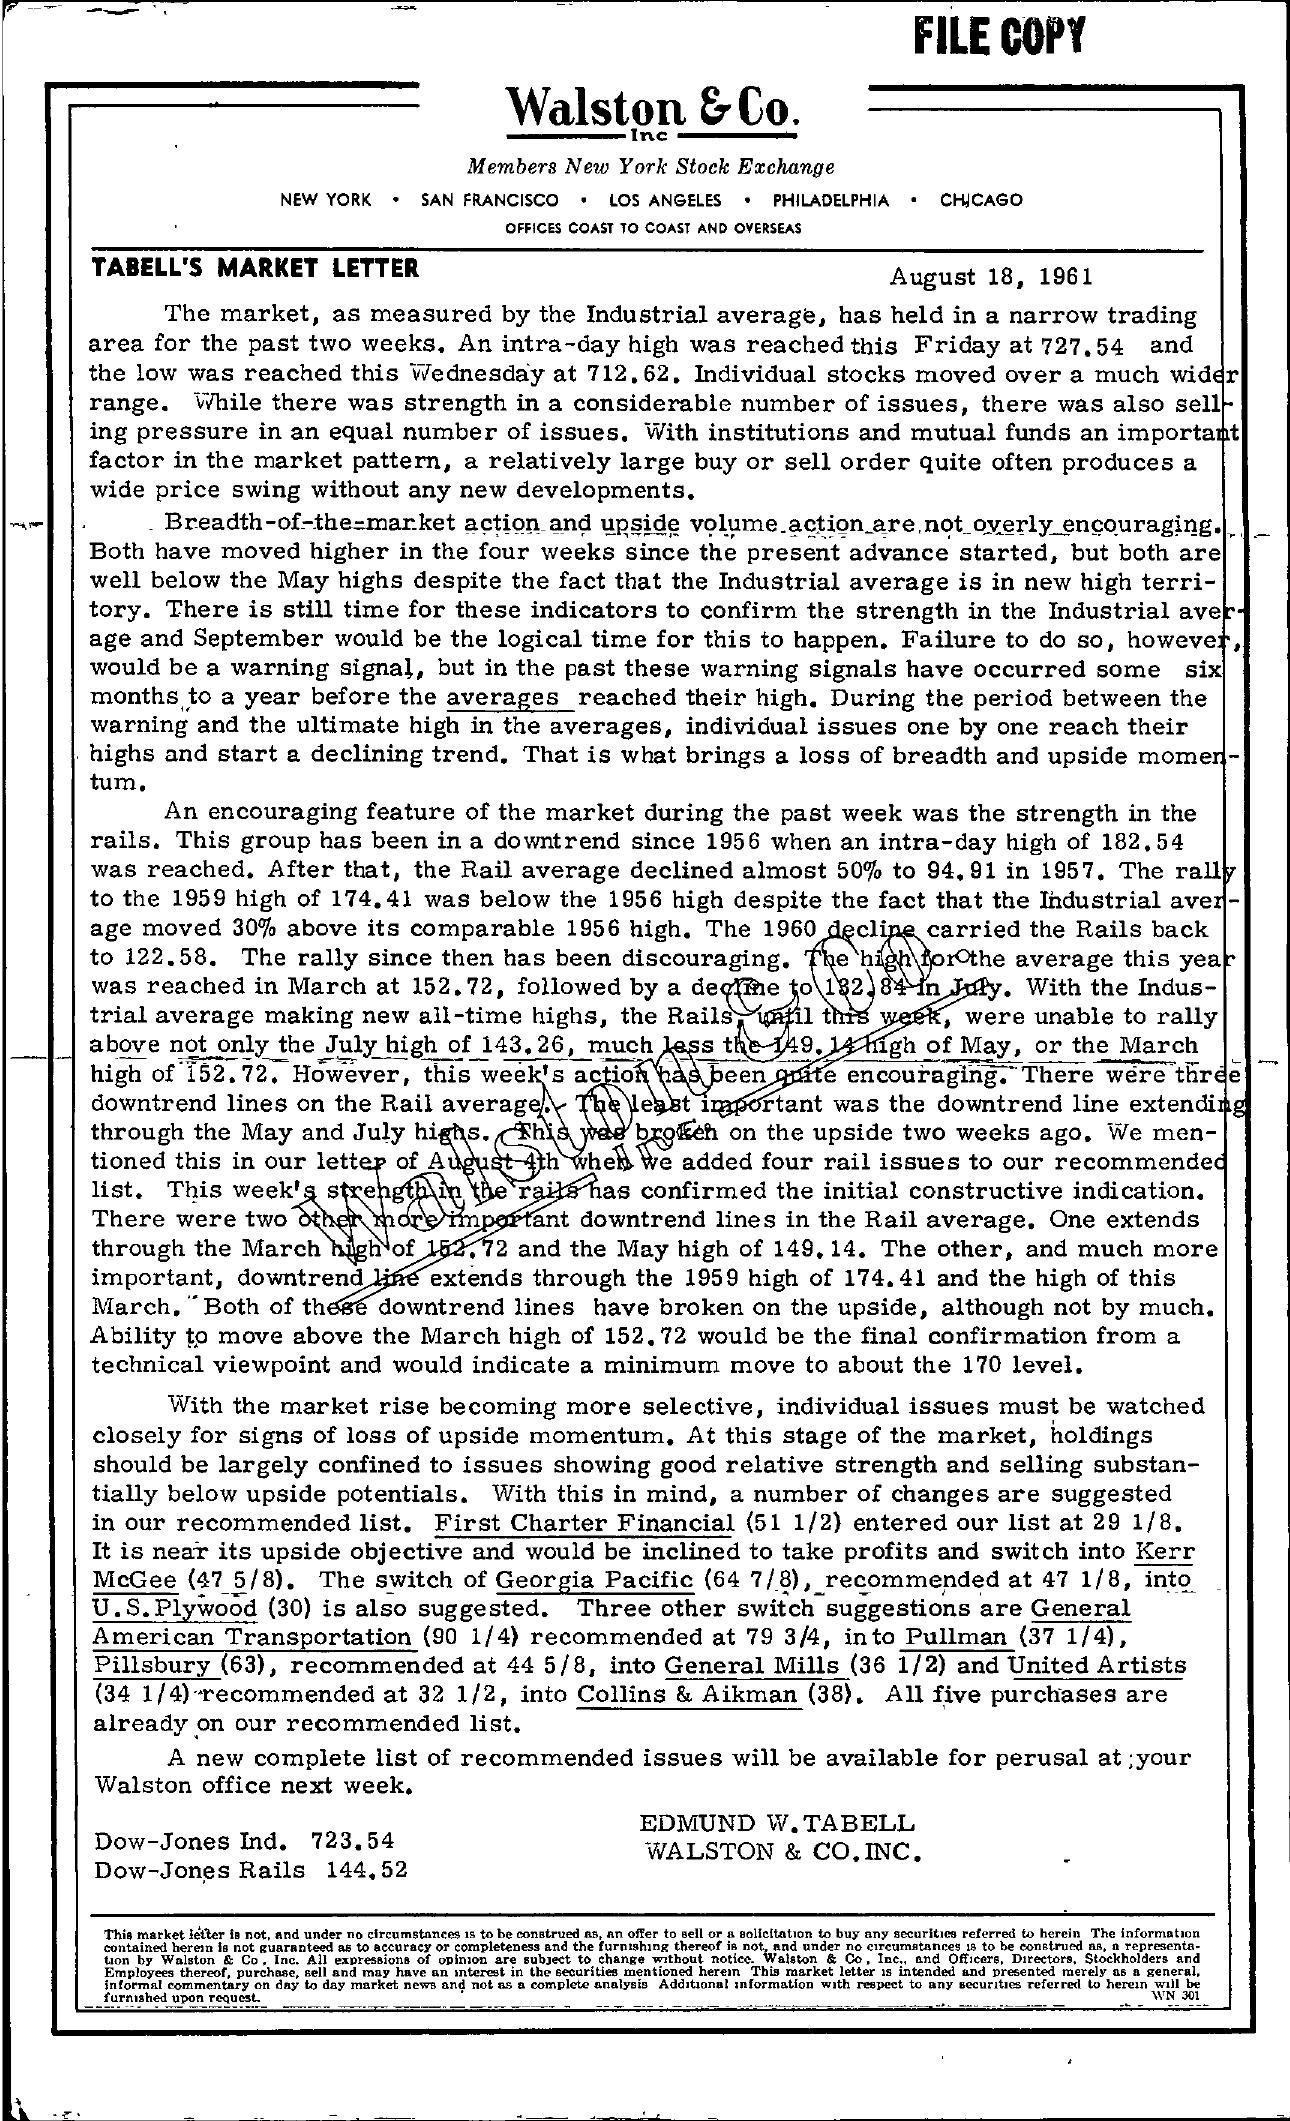 Tabell's Market Letter - August 18, 1961